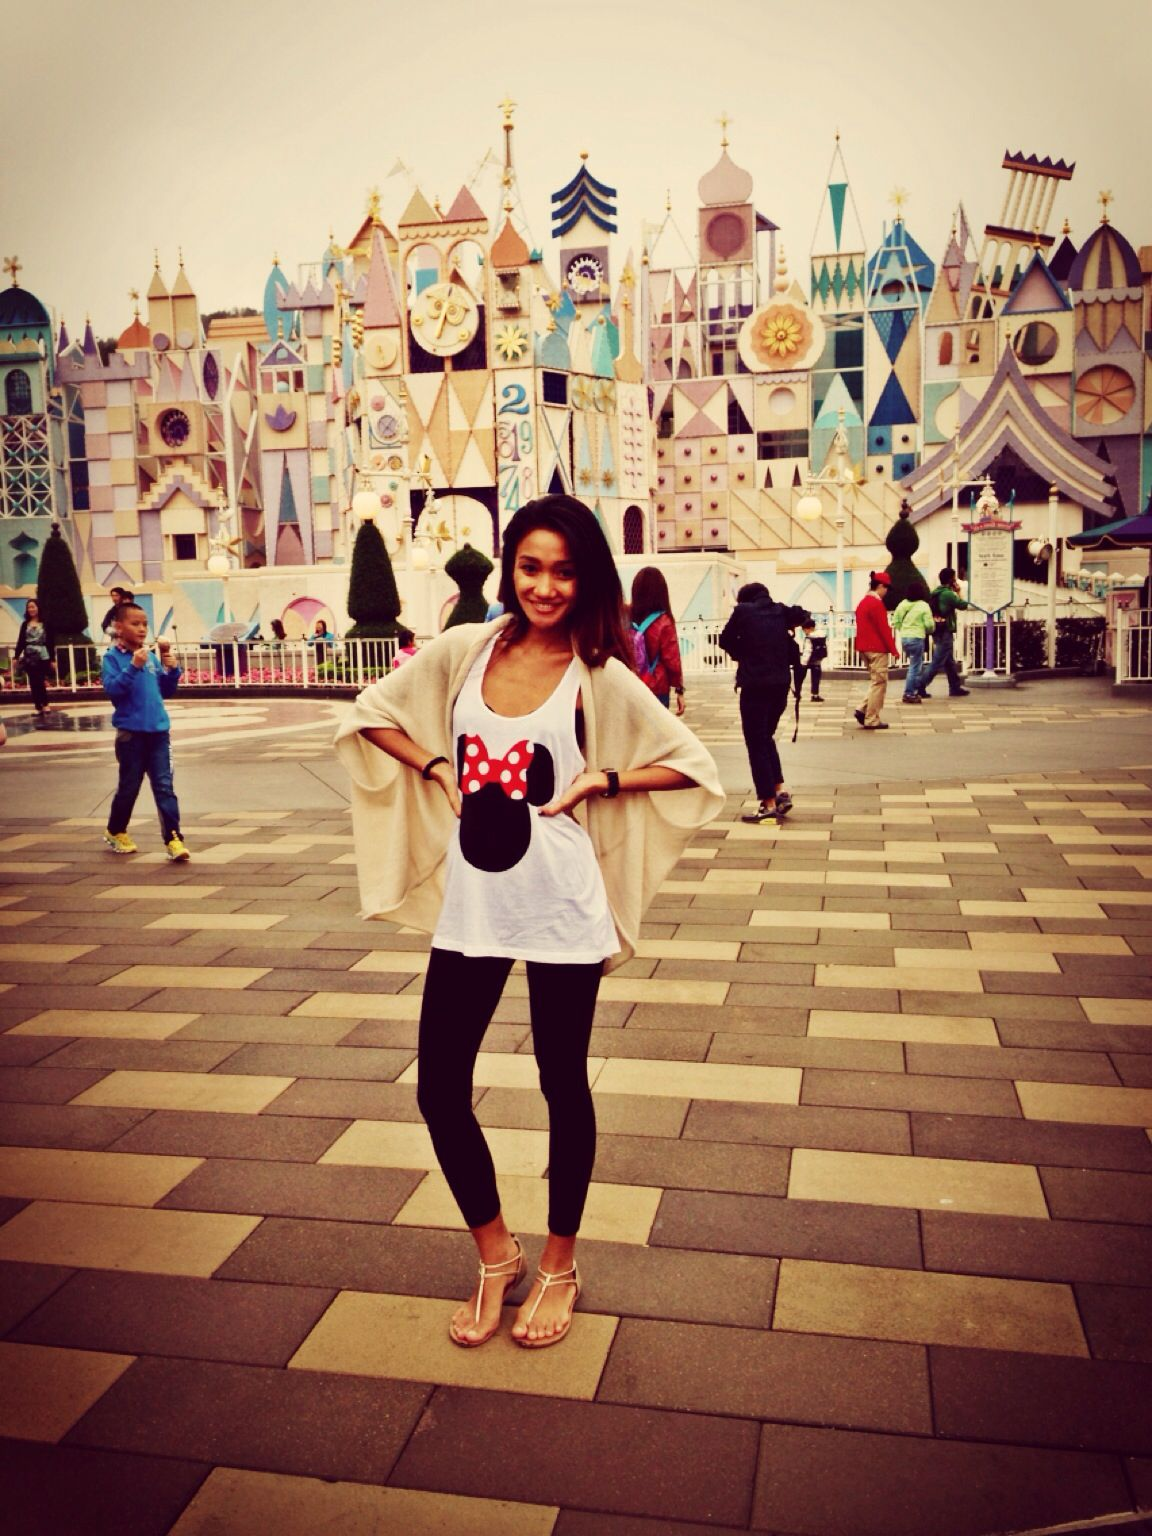 769442bb13b5 Disneyland outfit